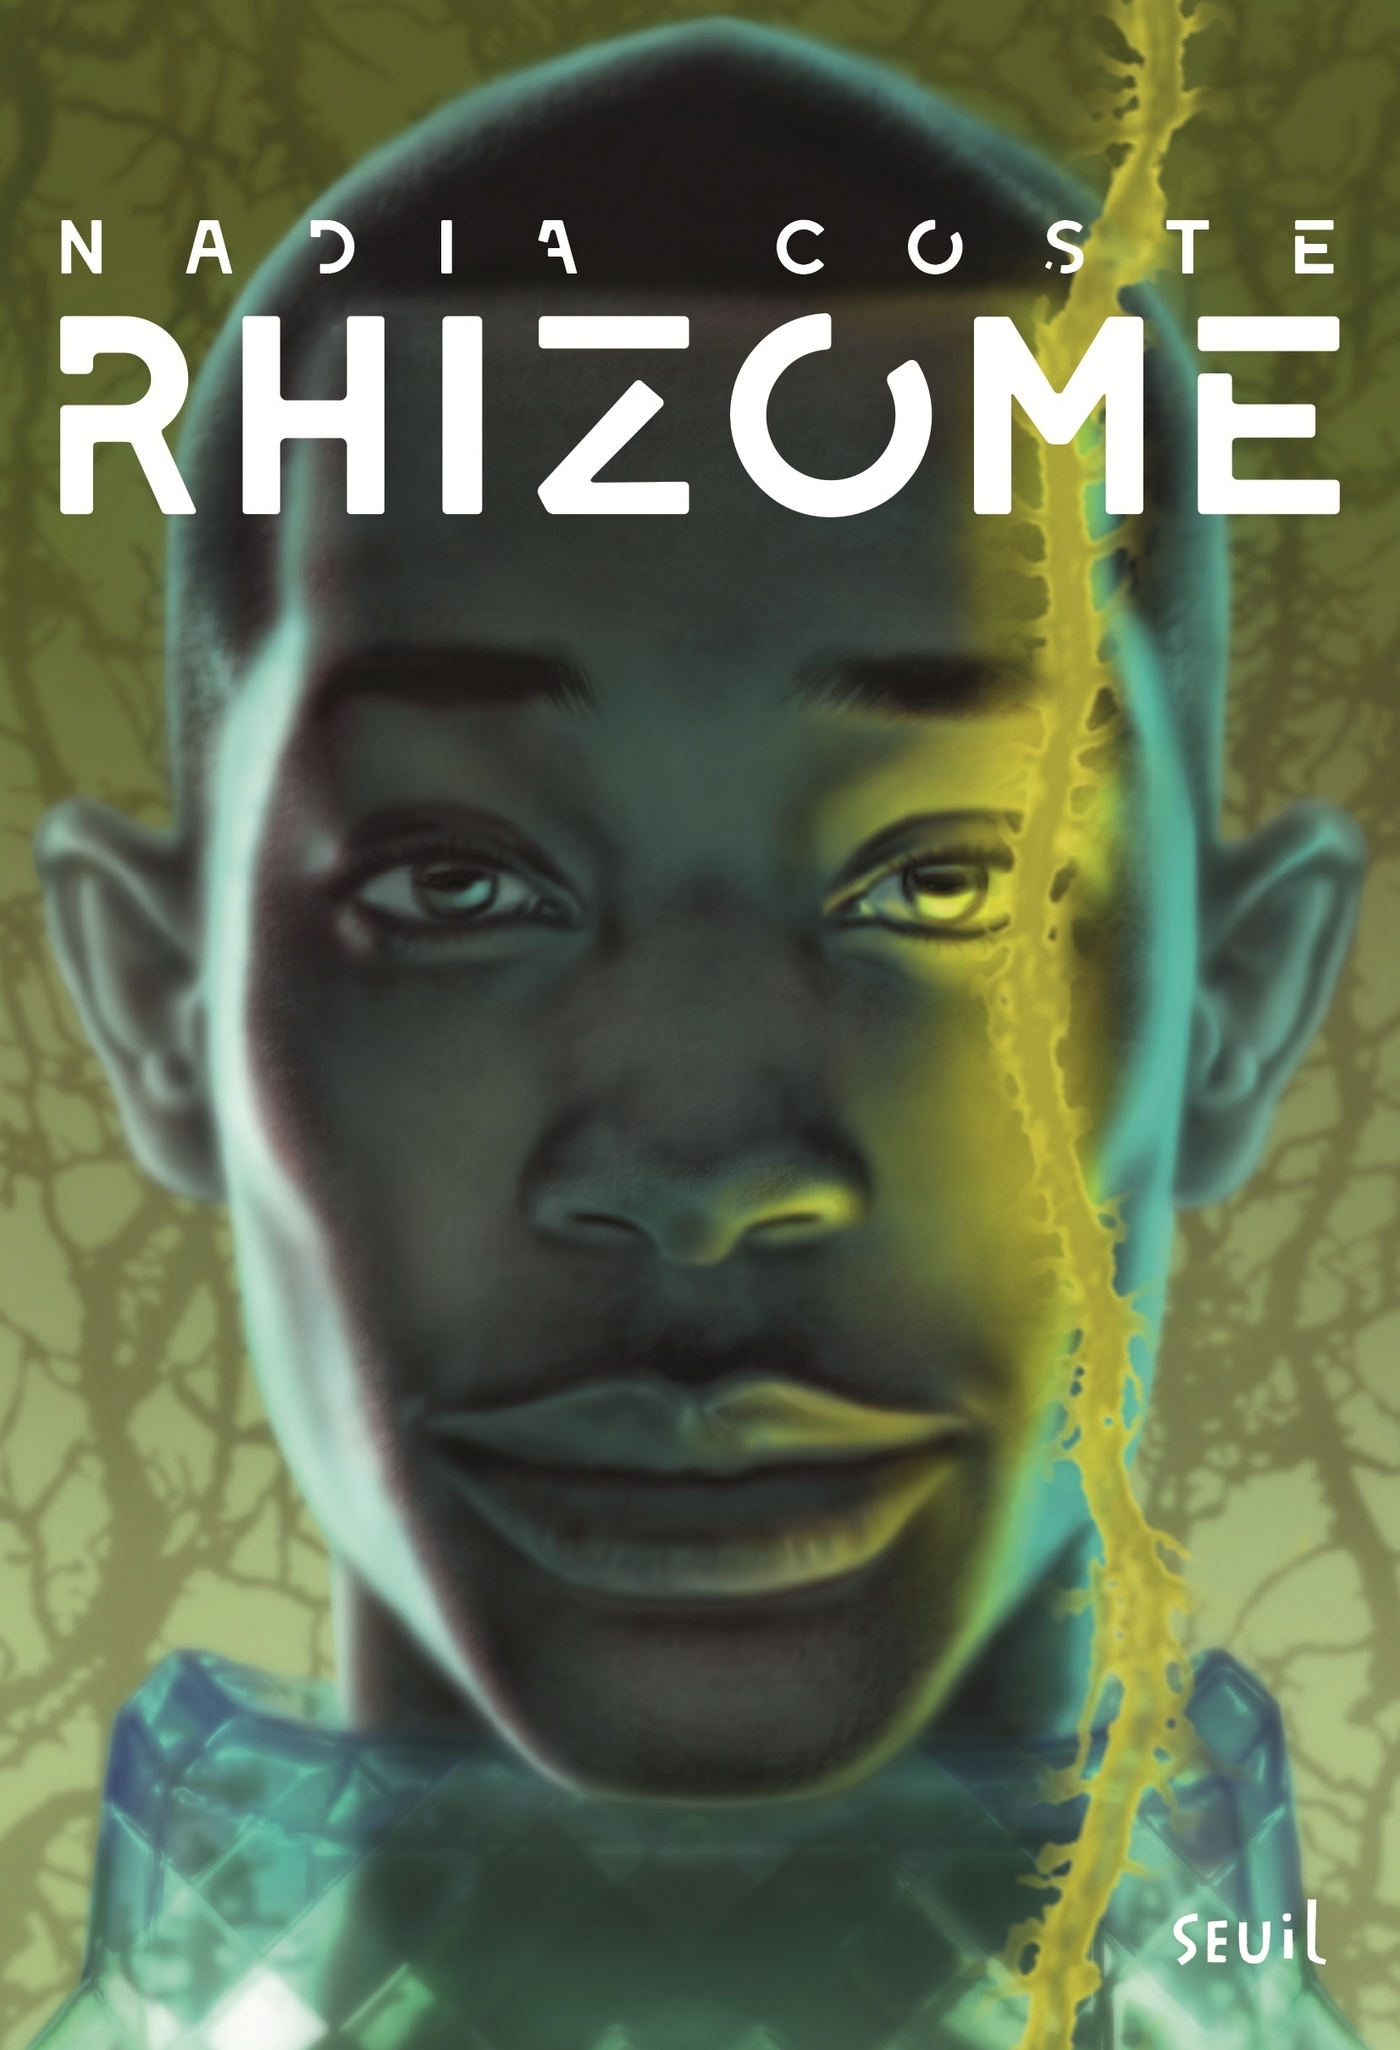 Rhizome | Coste, Nadia